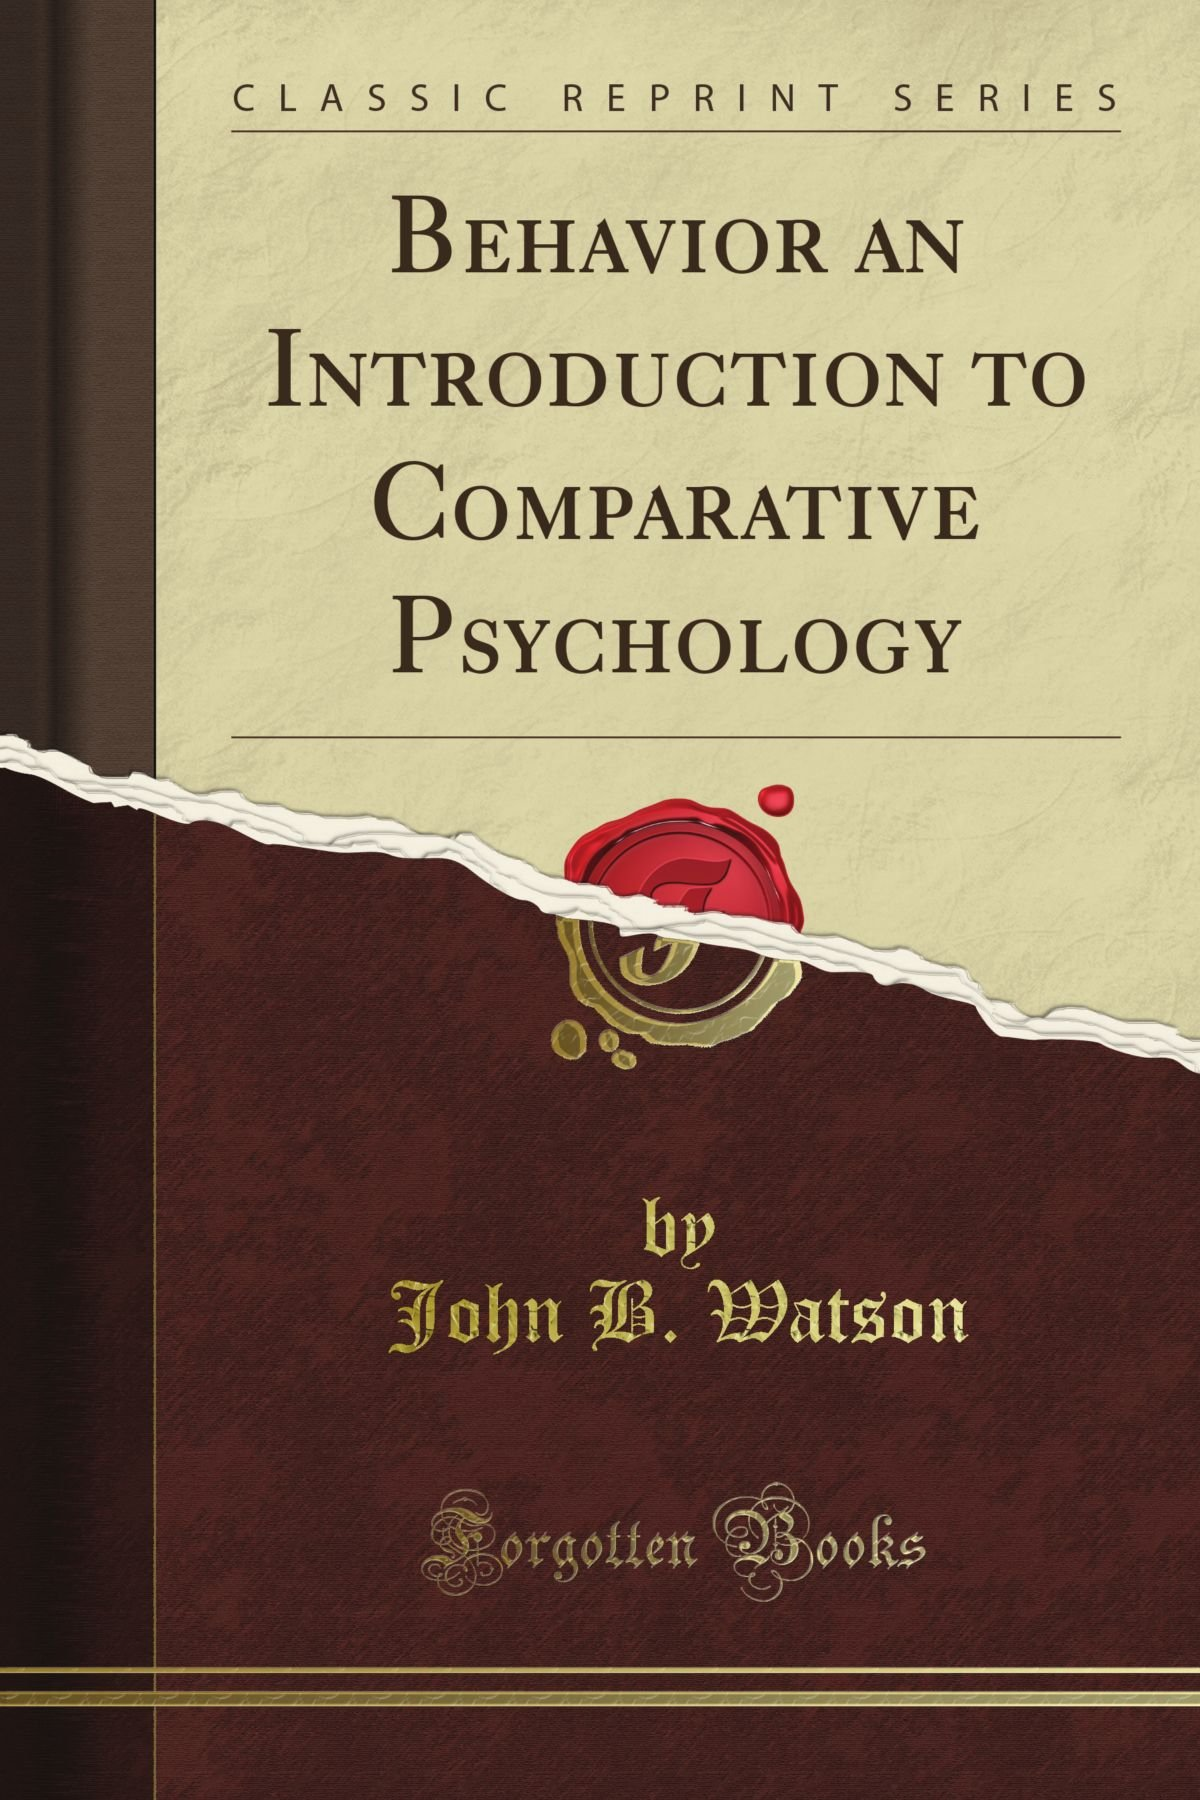 john b watson articles